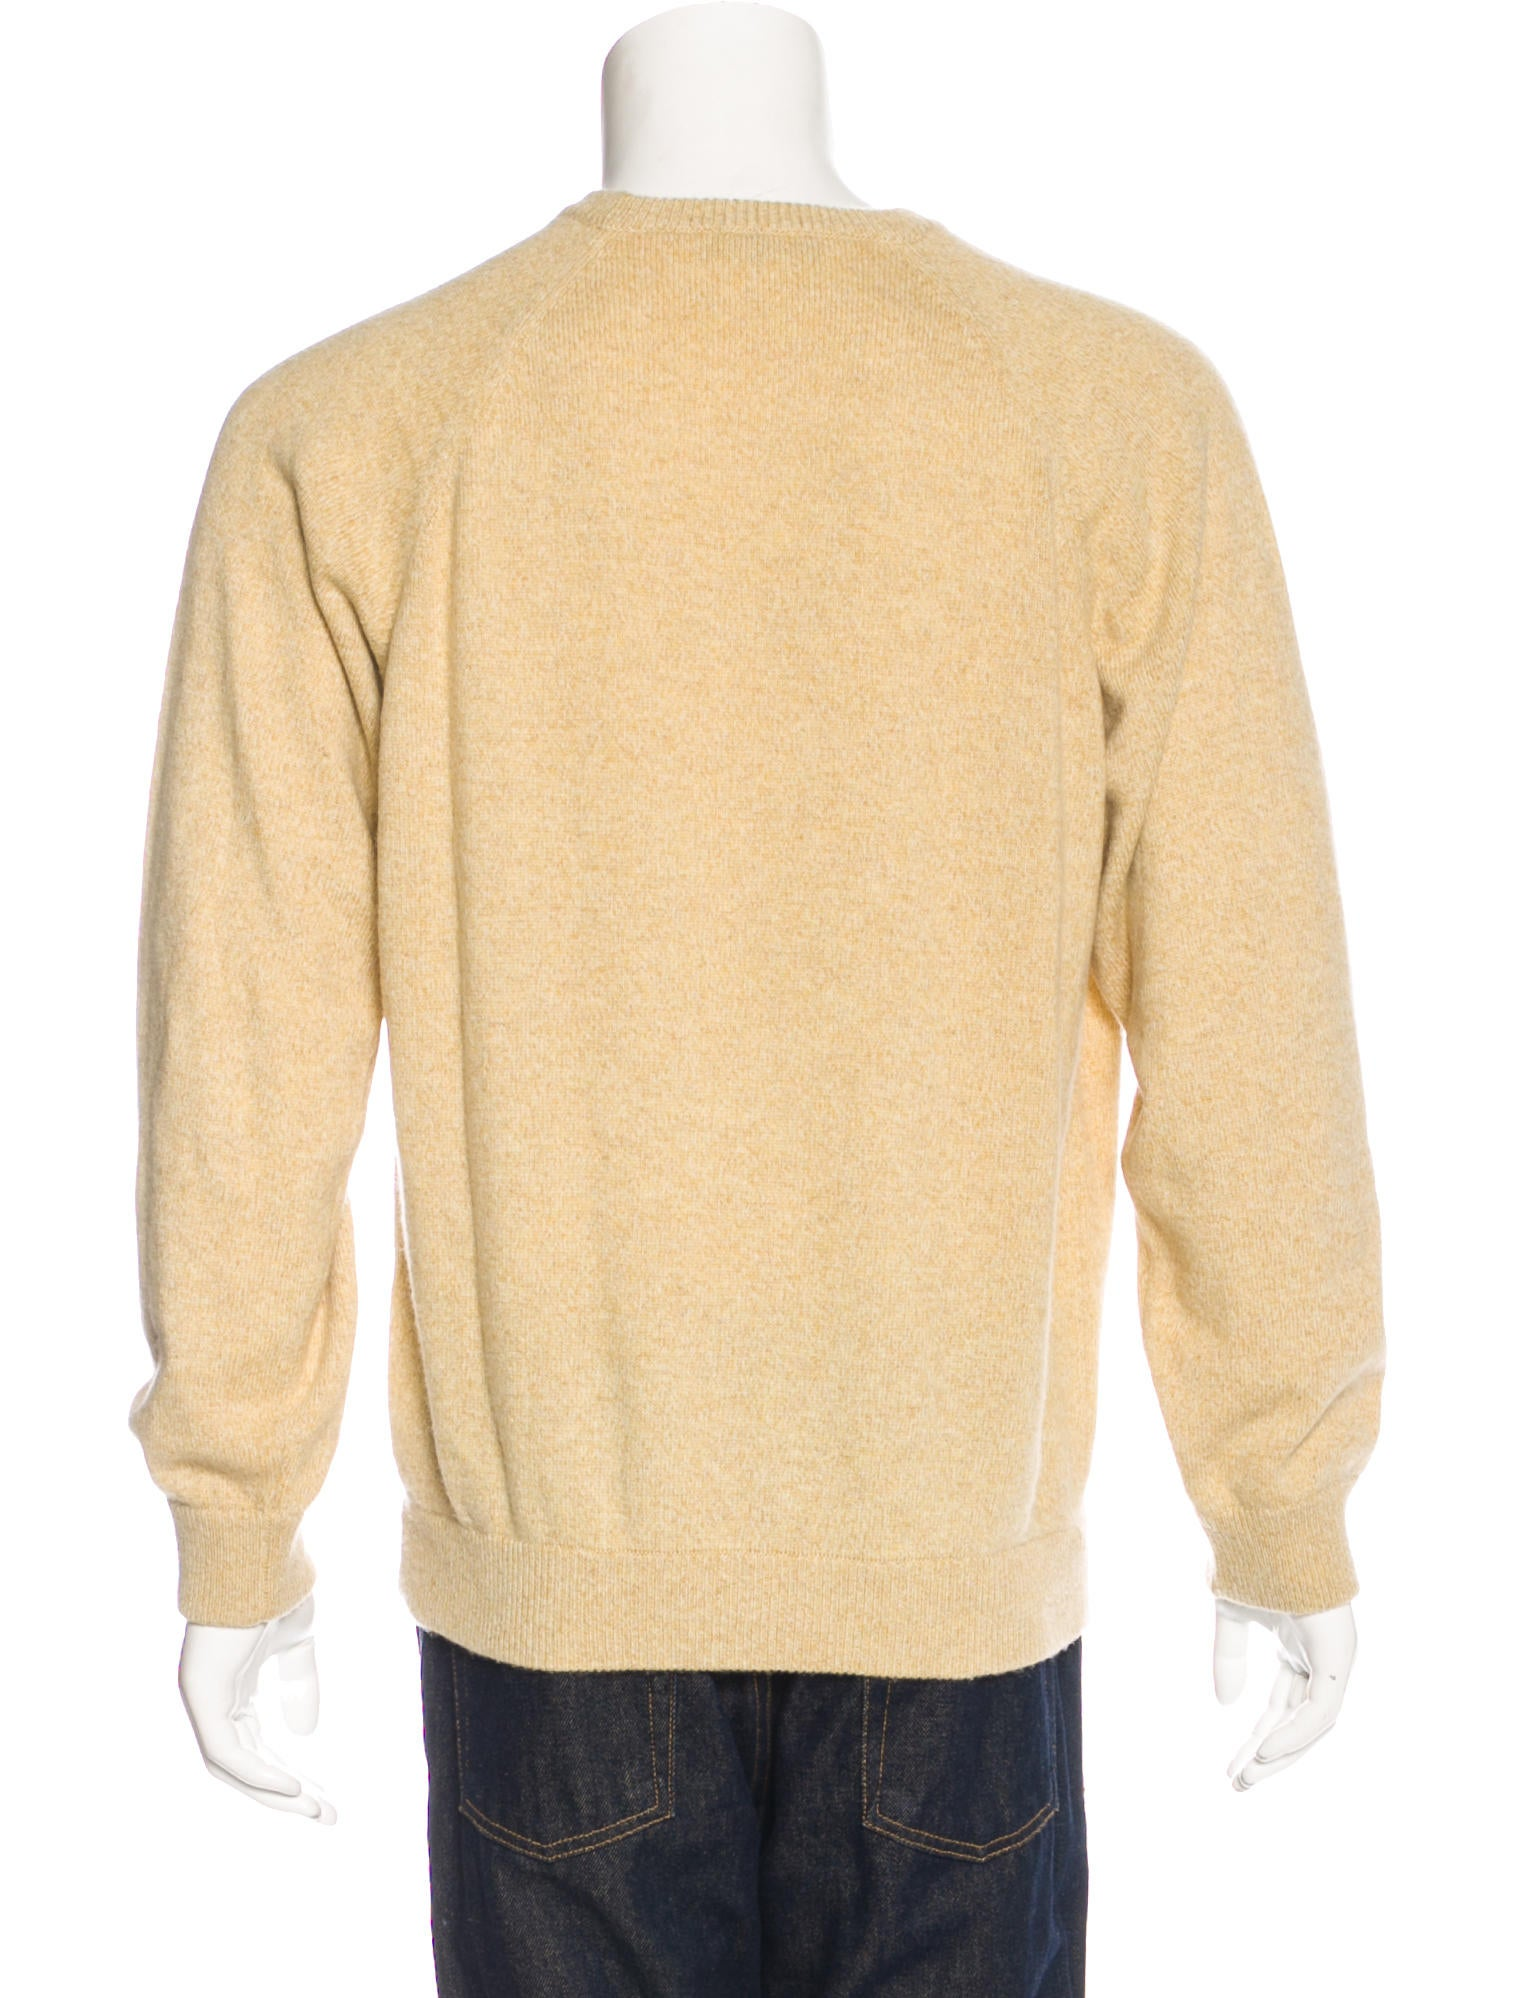 Loro Piana Cashmere Crew Neck Sweater - Clothing - LOR38141 | The ...